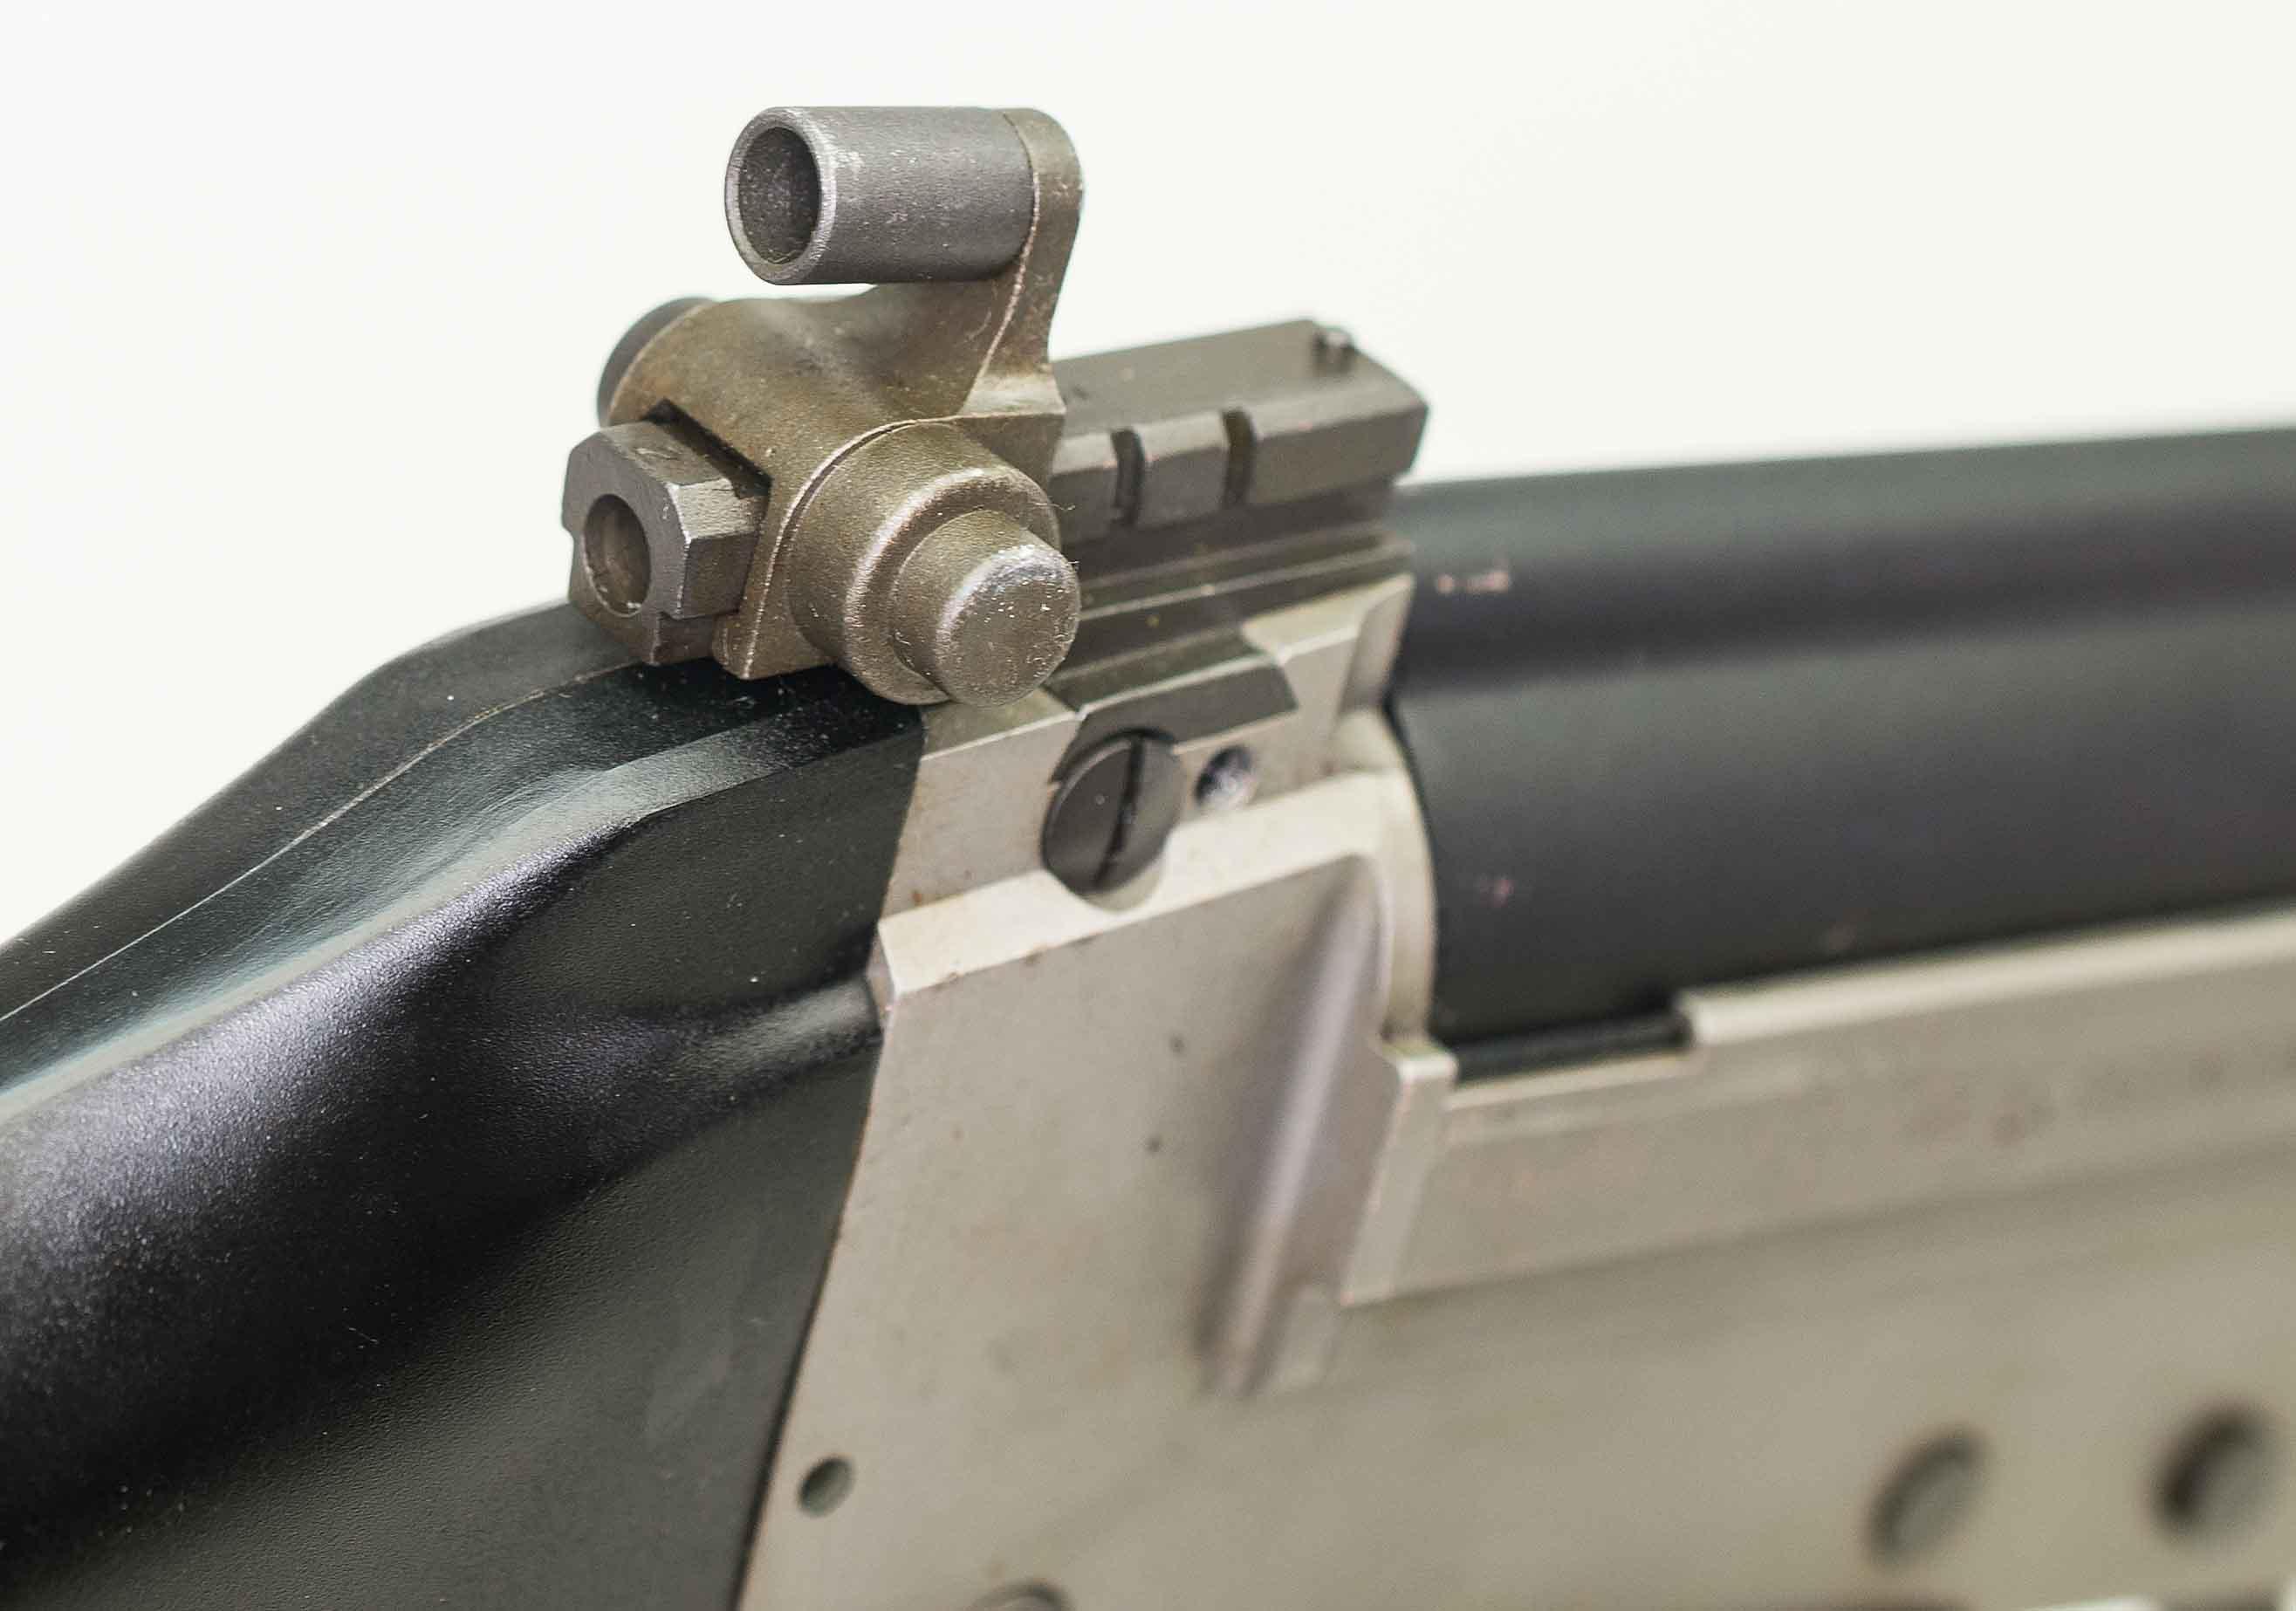 DSA FN FAL SA58 (Auction ID: 11793247, End Time : Jul  01, 2018 22